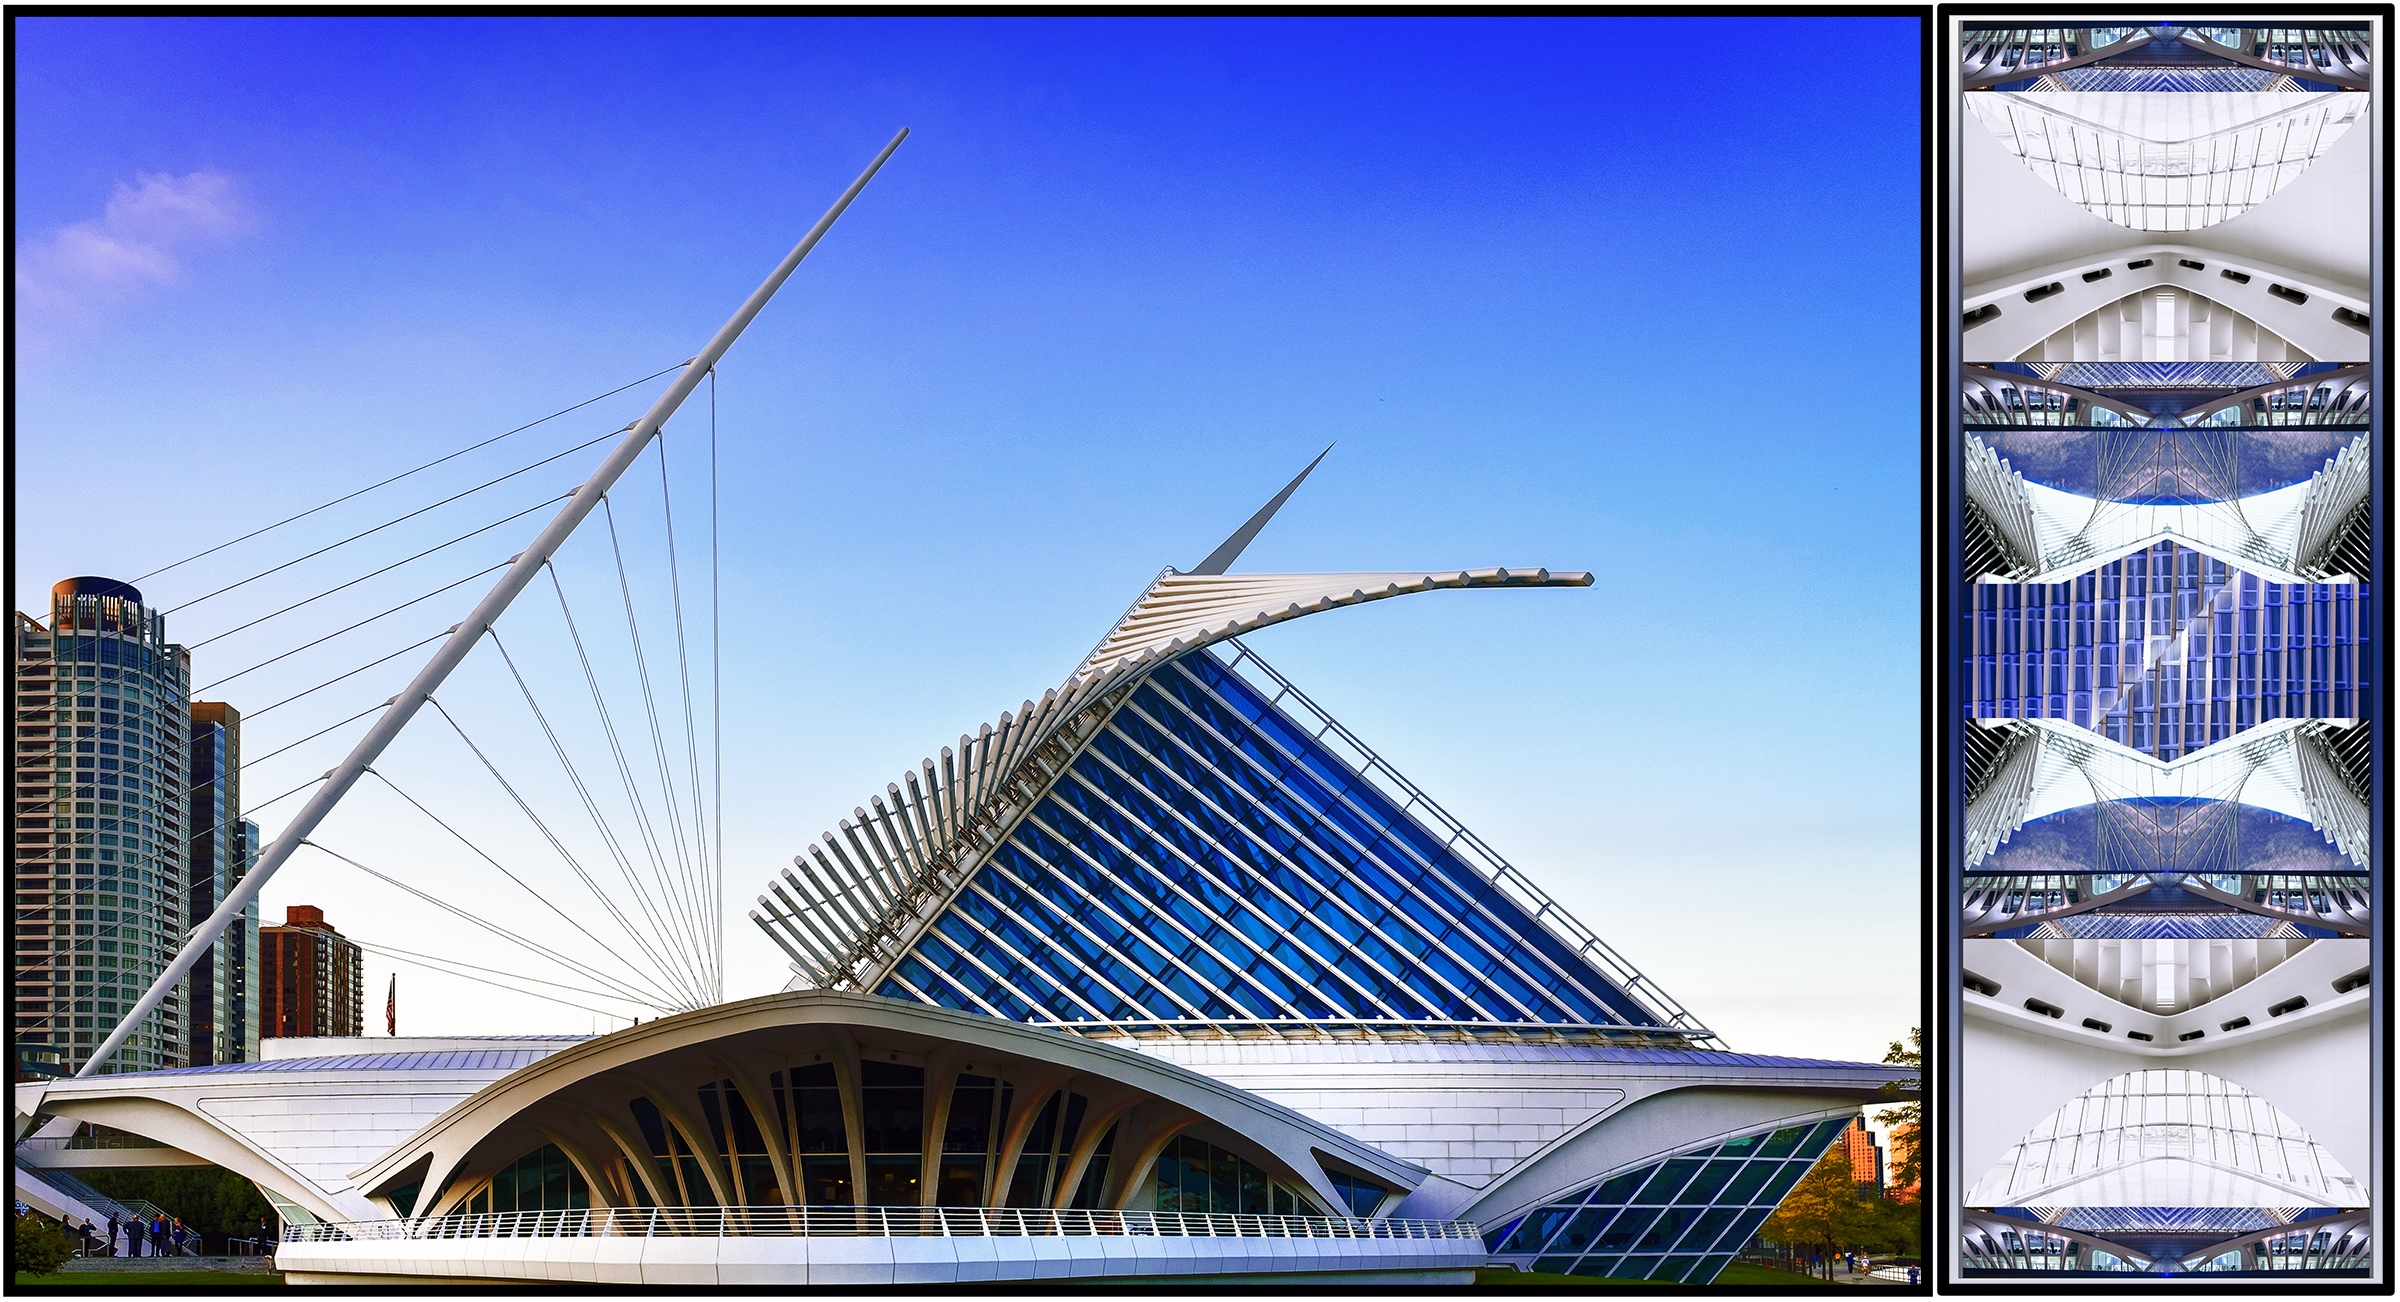 Milwaukee Art Museum | Santiago Calatrava, Architect -